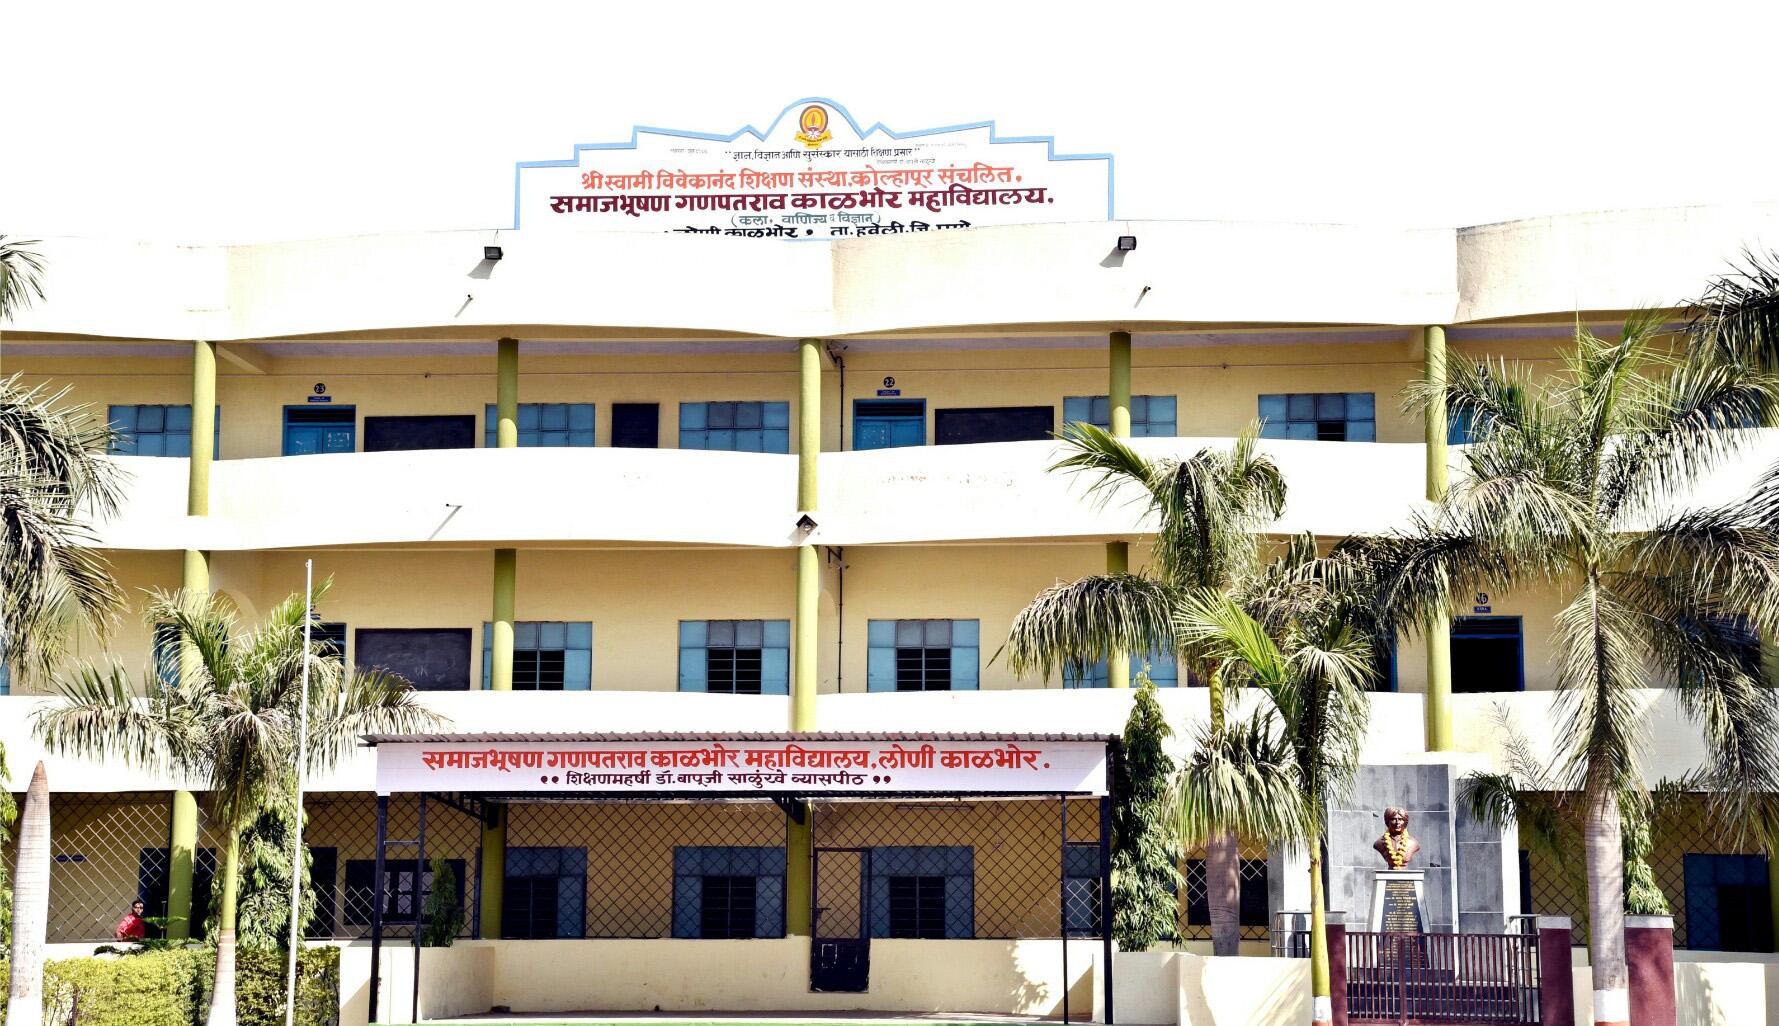 Samajbhushan Ganpatrao Kalbhor Arts, Commerce & Science College, Loni Kalbhor